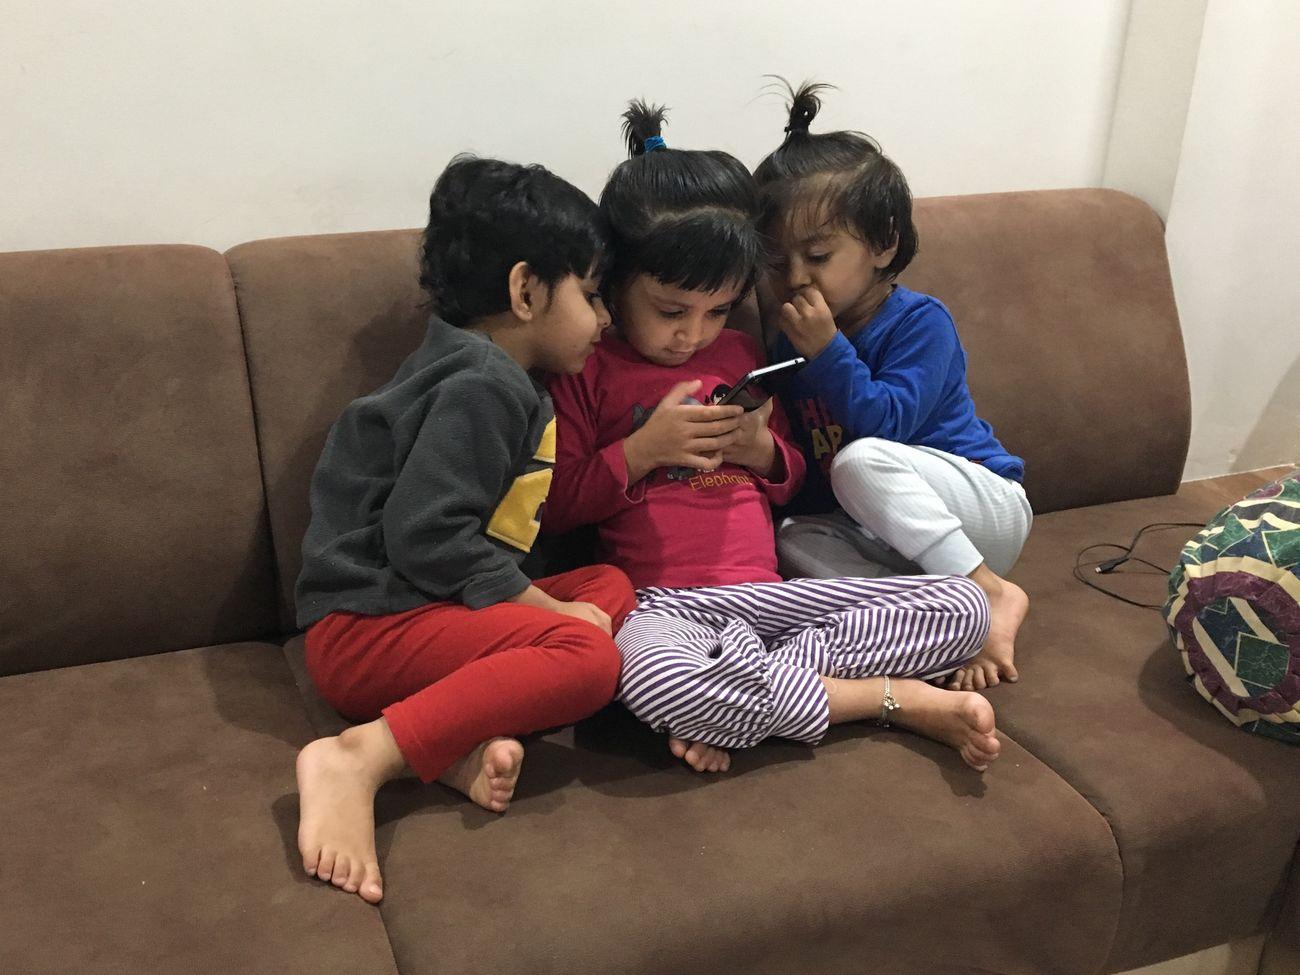 Mobile Conversations Kids Mobile Involved Three Girls Sofa Indoors  Girls Sitting Togetherness Childhood